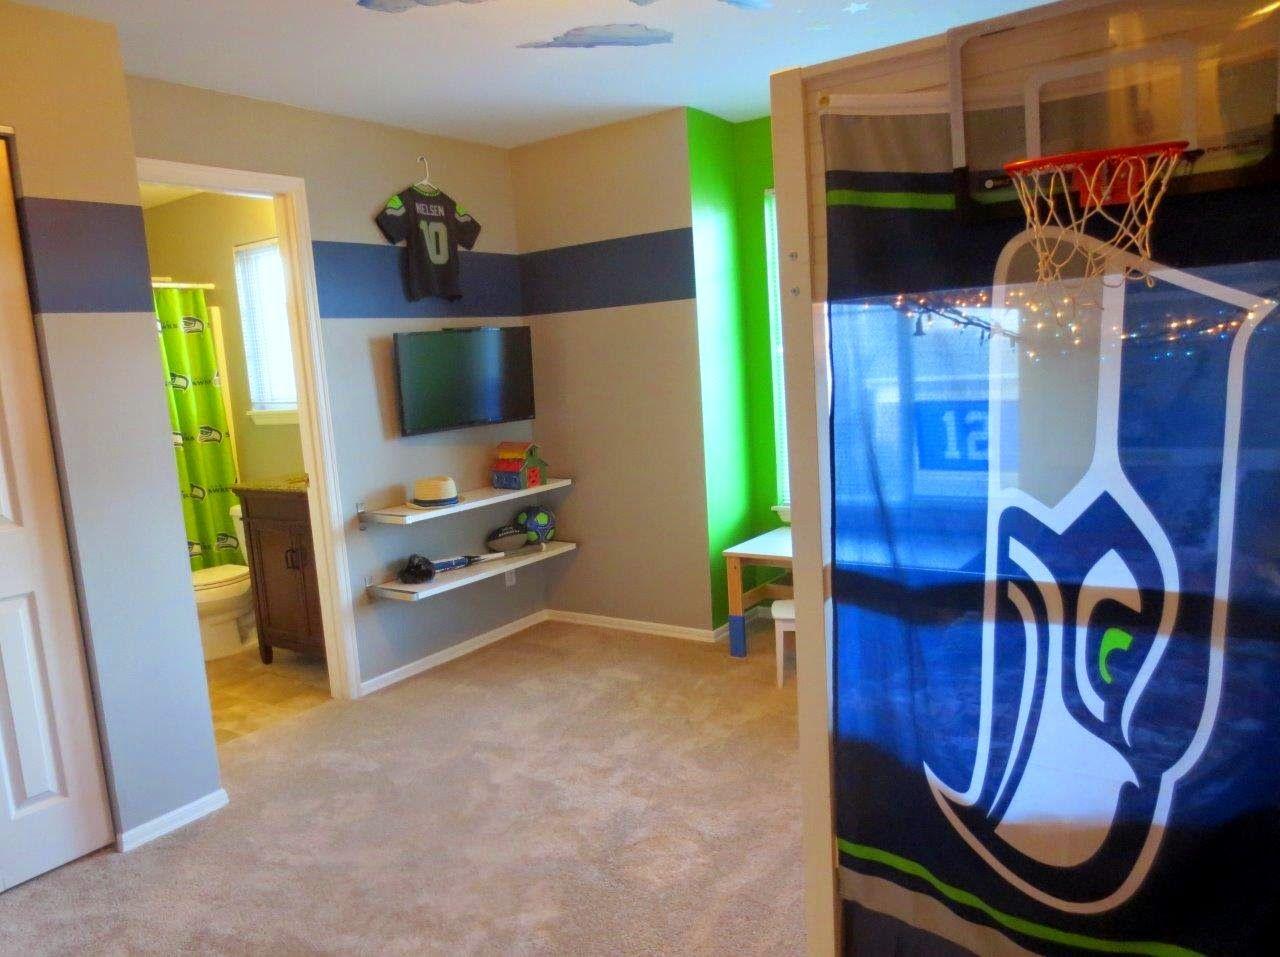 Seahawks Themed Bedroom Bedroom Themes Boys Room Design